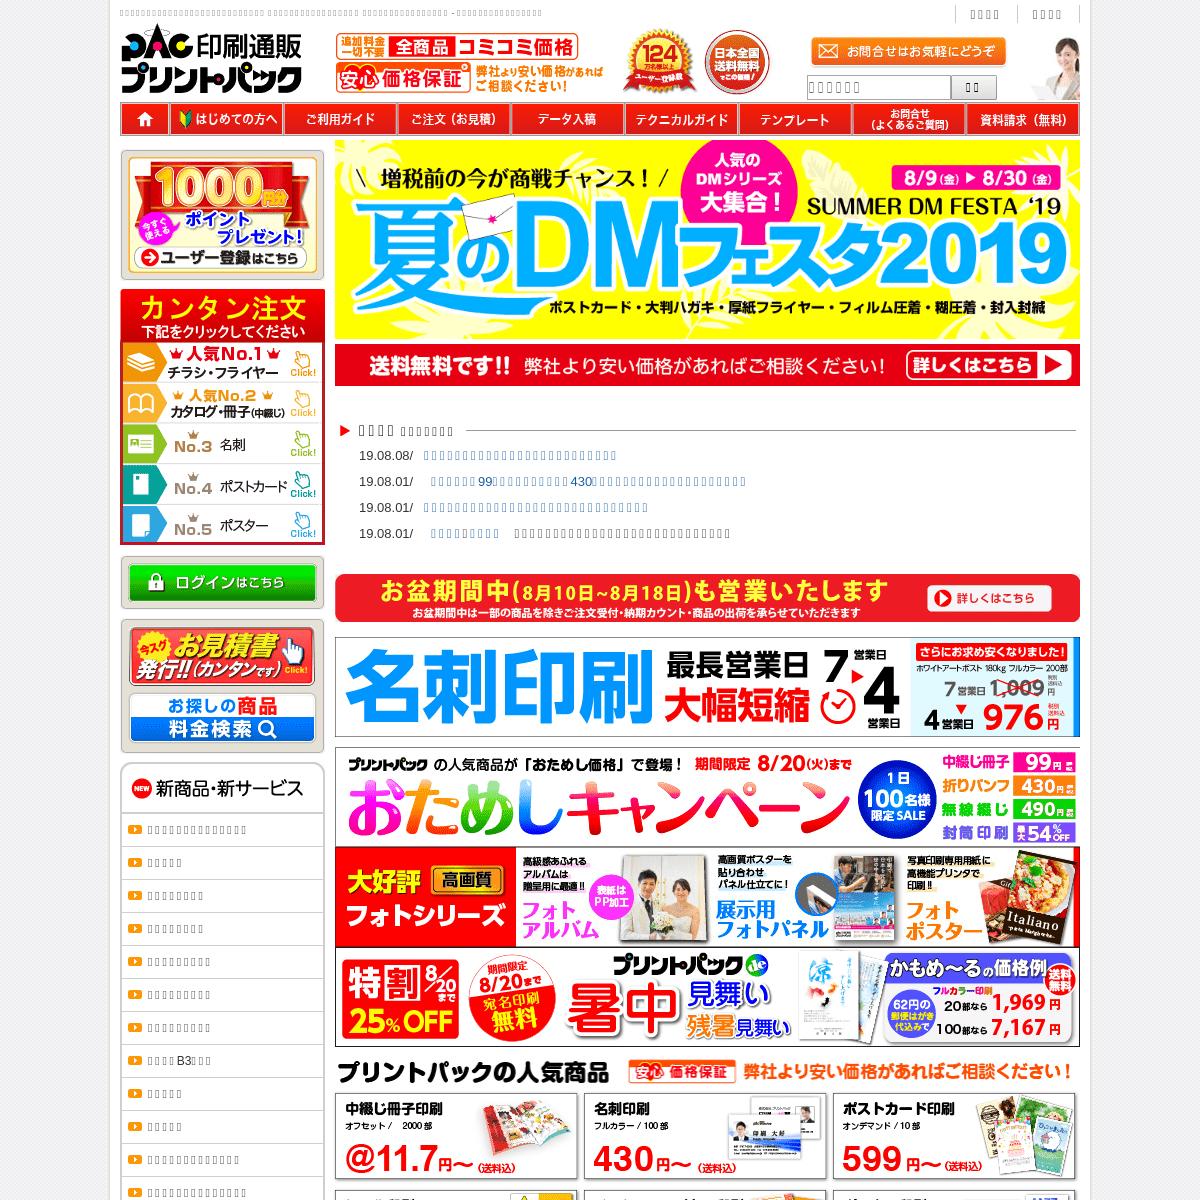 ArchiveBay.com - printpac.co.jp - 印刷のことなら【印刷通販プリントパック】≪ユーザー数No.1≫